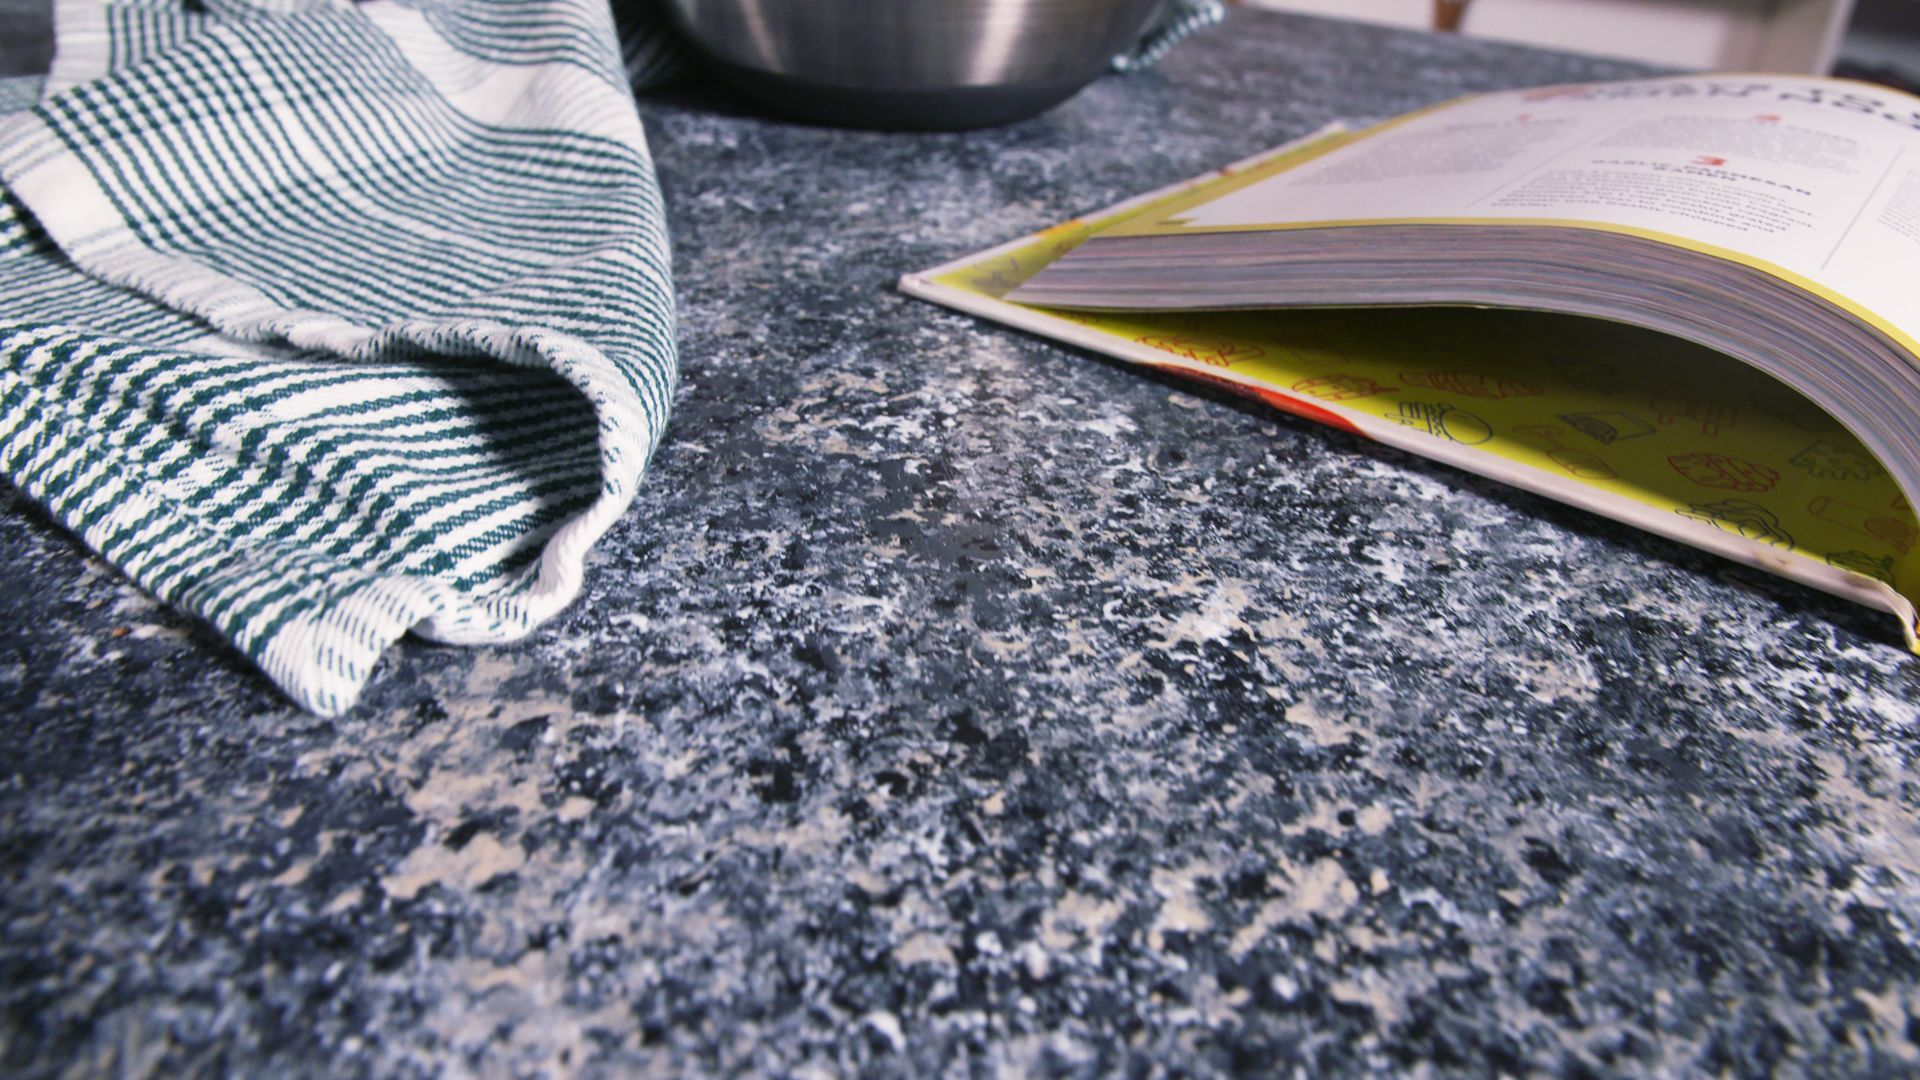 Giani Slate Countertop Paint Kit Review